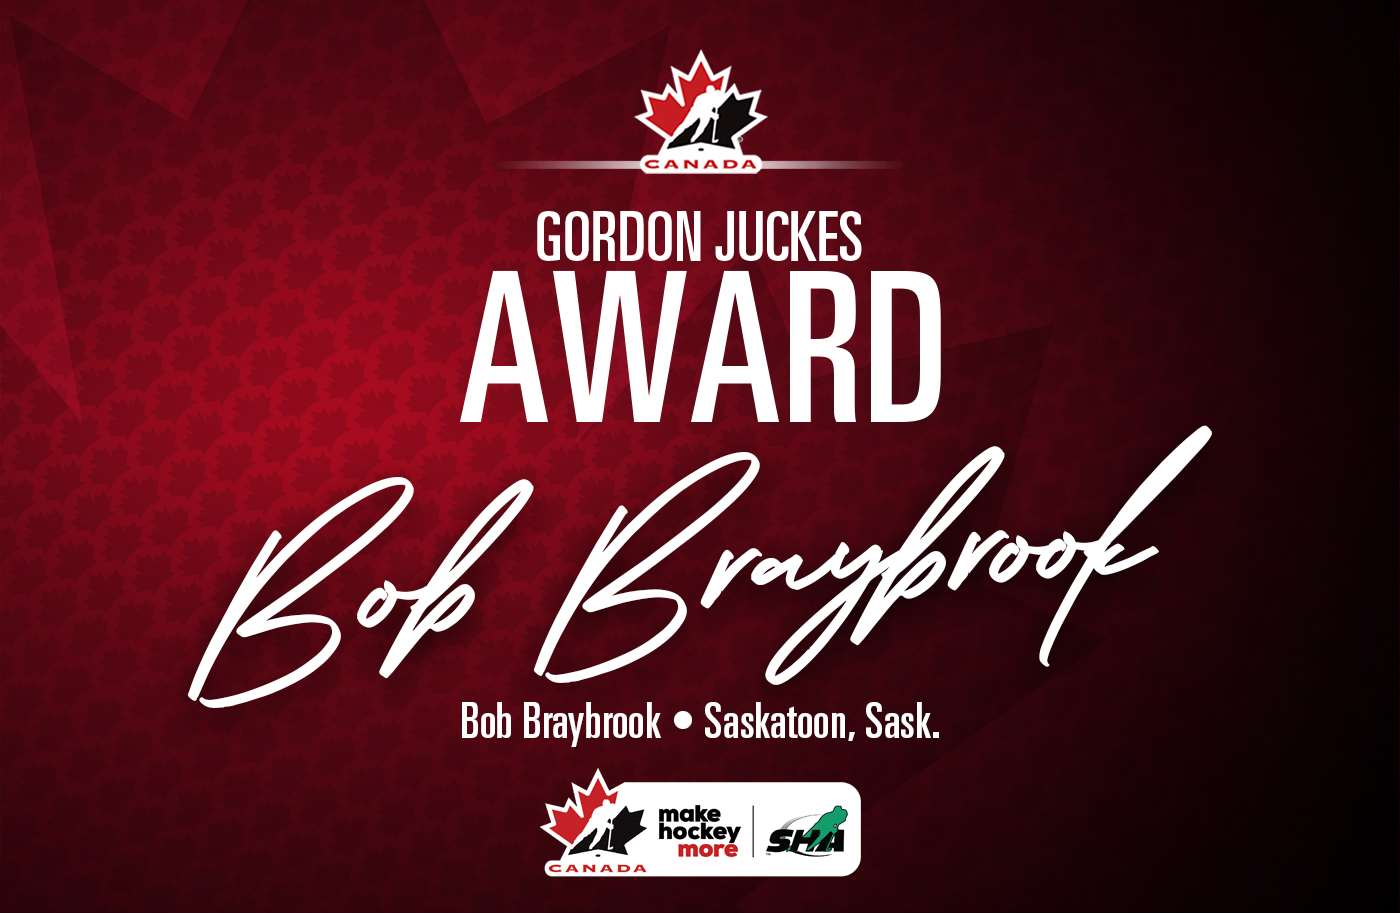 2021 gordon juckes award bob braybrook 1400 e